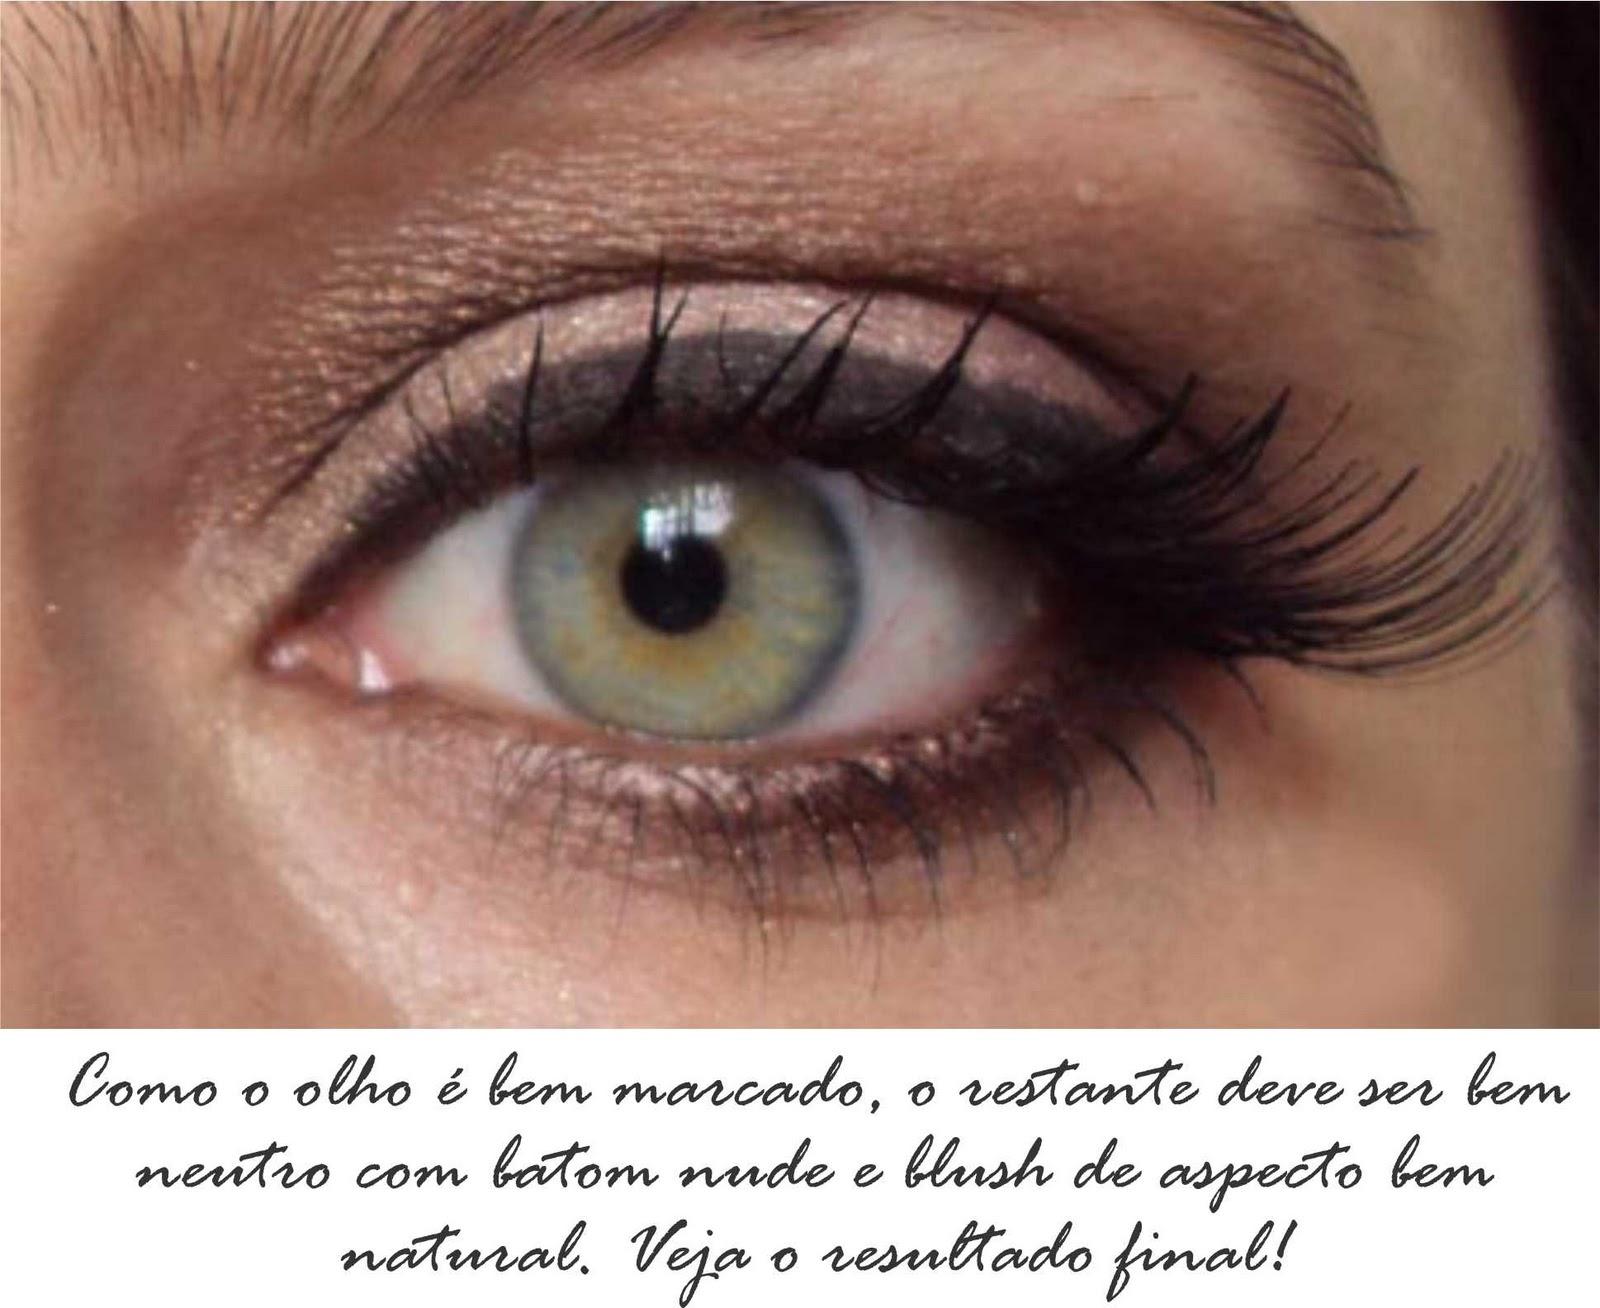 http://4.bp.blogspot.com/-U3Z6LXMiQCQ/TopN2mkspMI/AAAAAAAAAQw/95R3Ab3nBqo/s1600/Make+Adele4.jpg